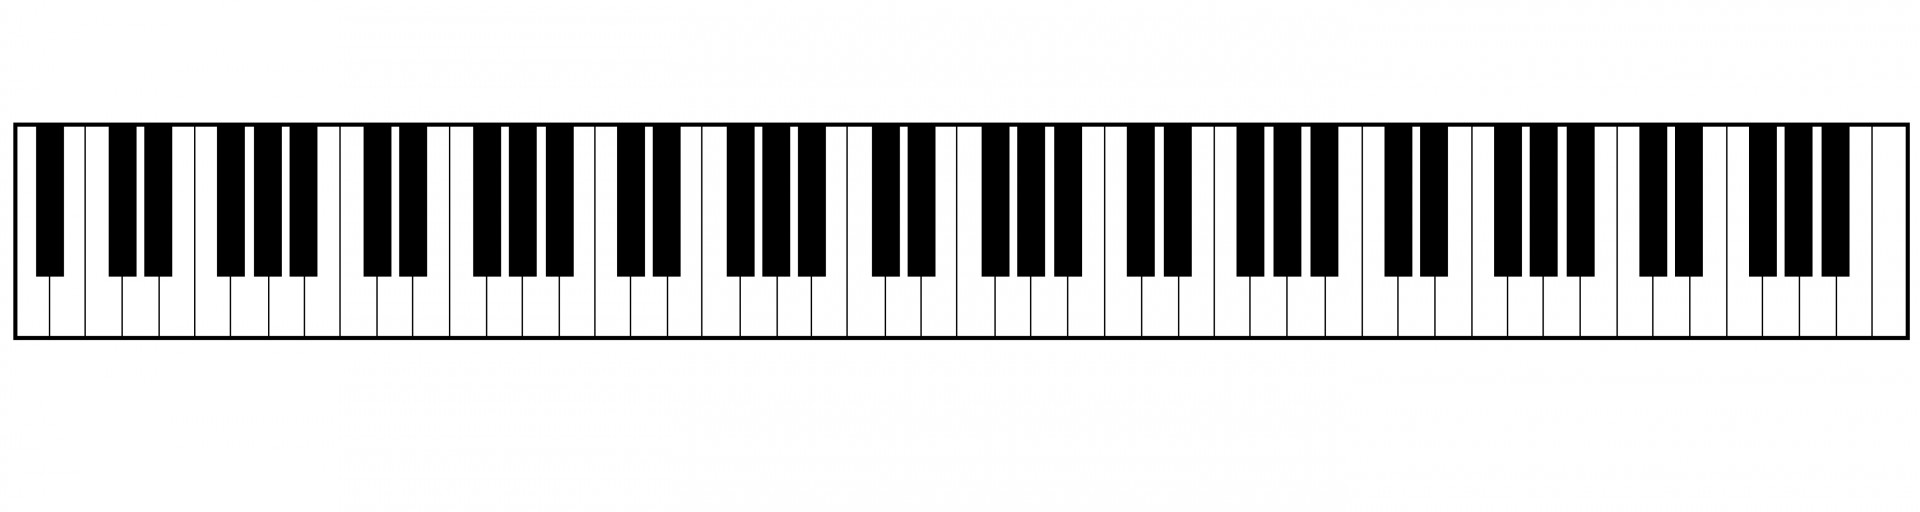 1920x512 Piano Keyboard Clipart Free Stock Photo